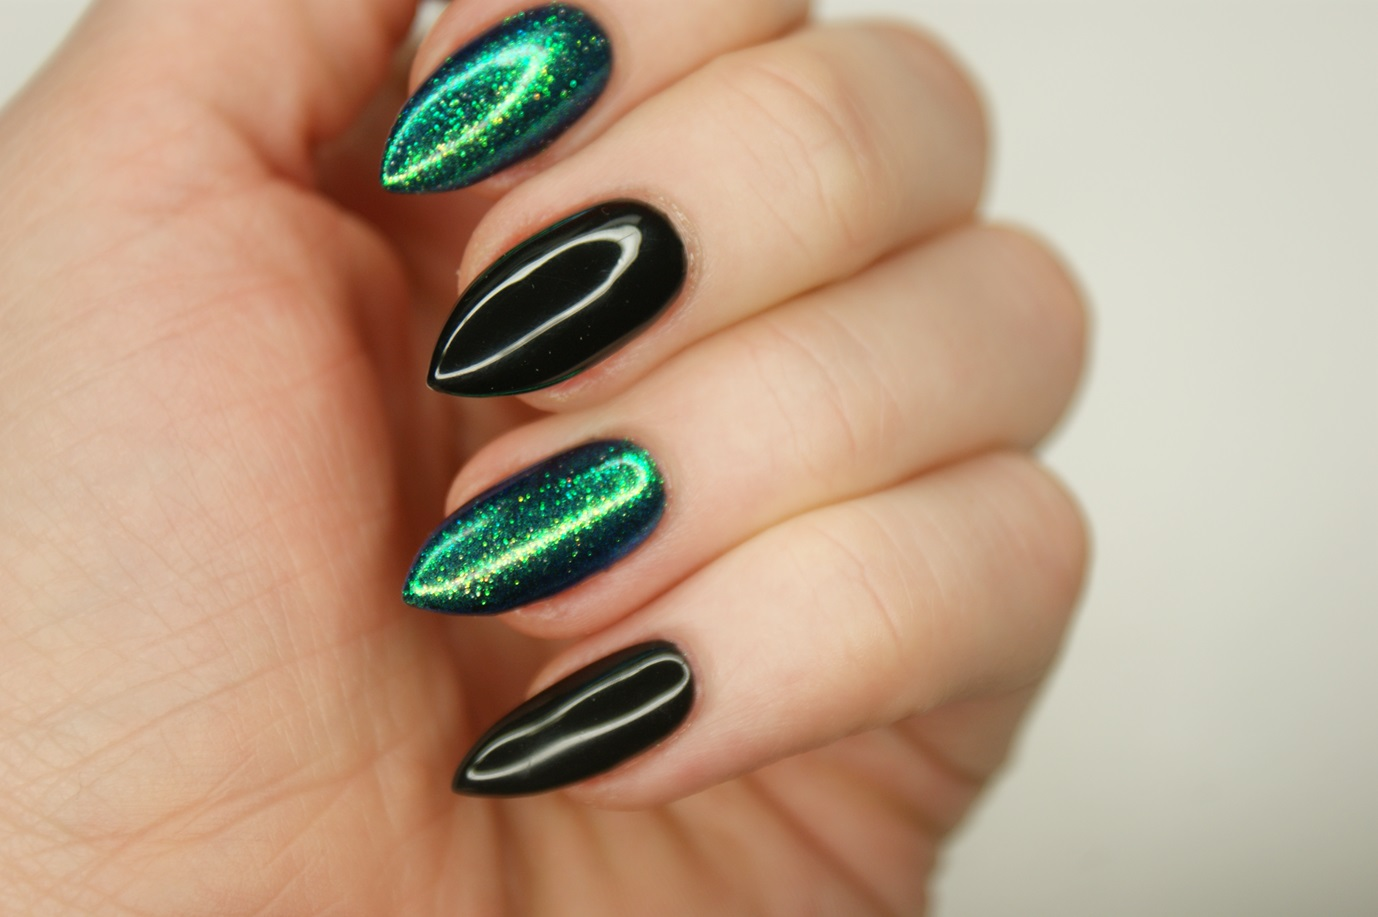 Biankowo Manicure Hybrydowy Semilac 10 Black Diamond 031